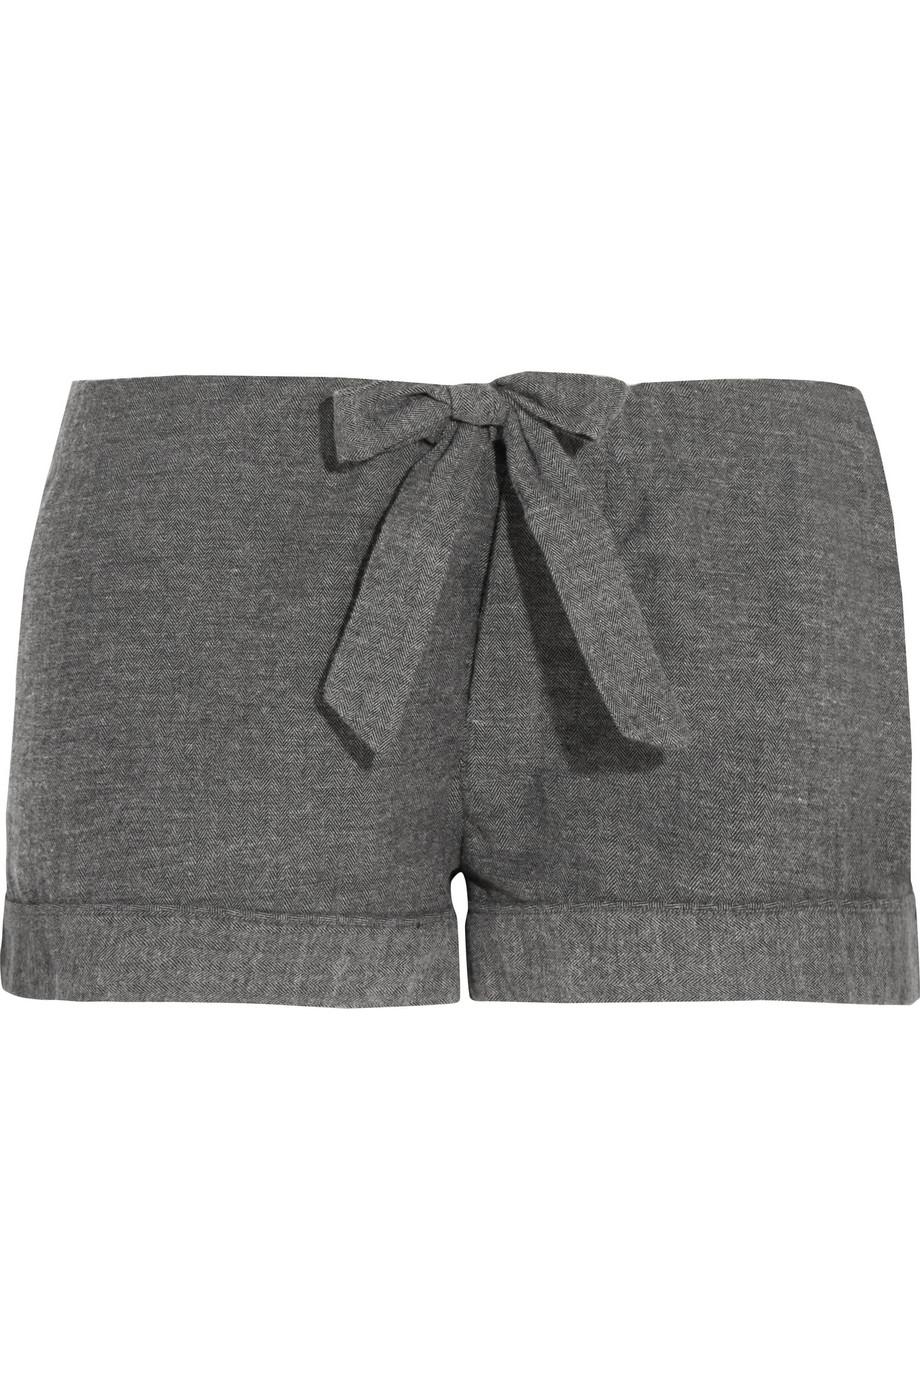 Montana herringbone brushed-cotton pajama shorts £40, Bodas. www.net-a-porter.com